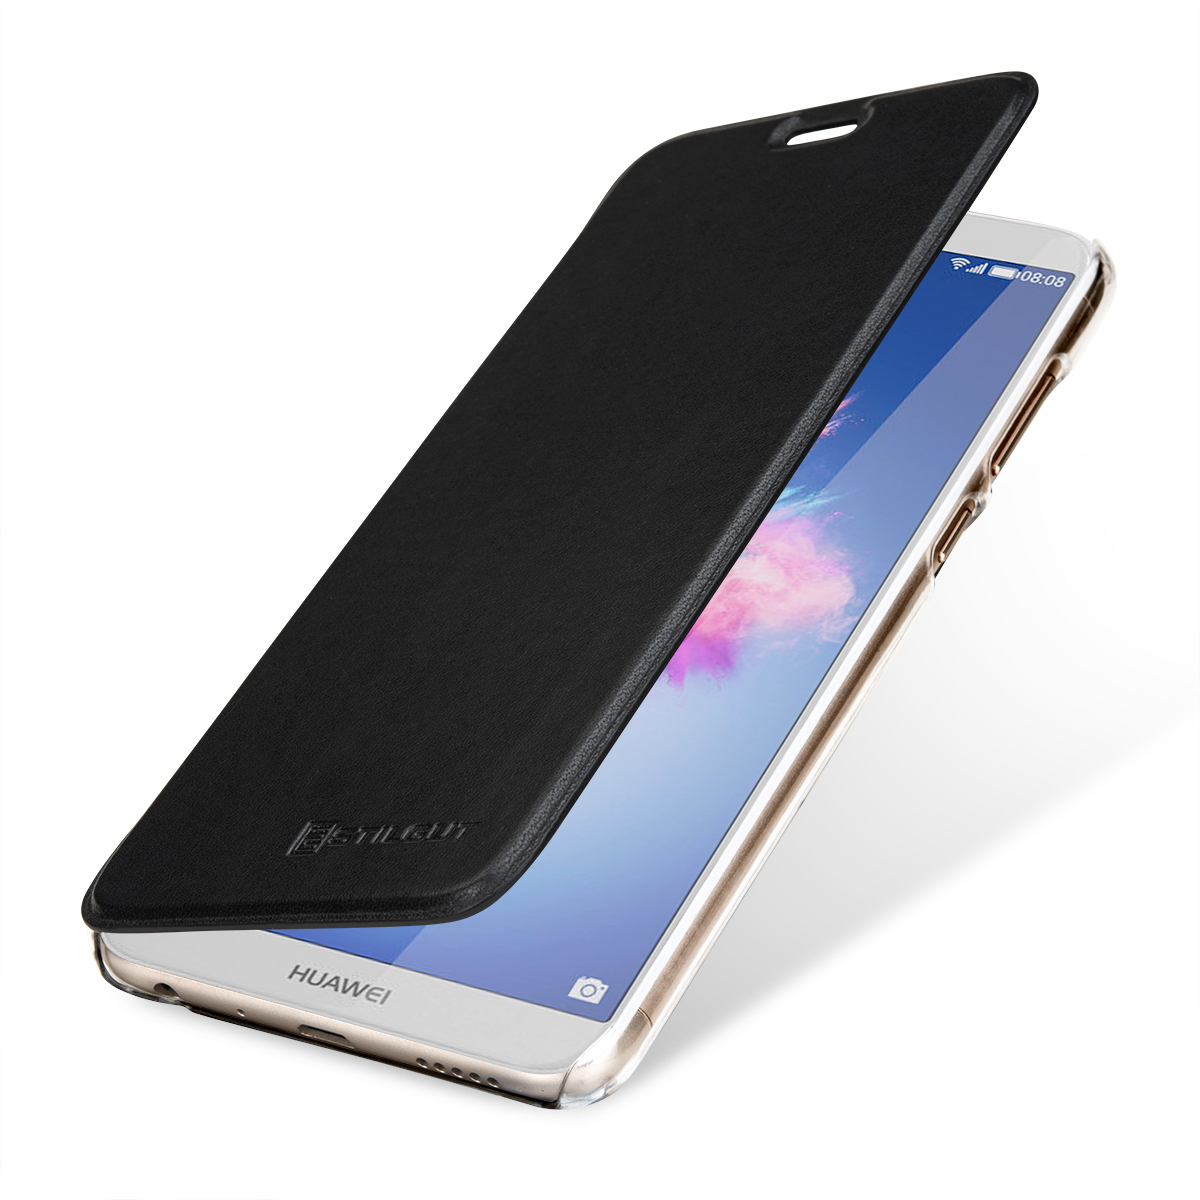 the best attitude 2b505 5345e StilGut - Huawei P smart Book Type NFC/RFID Blocking Case